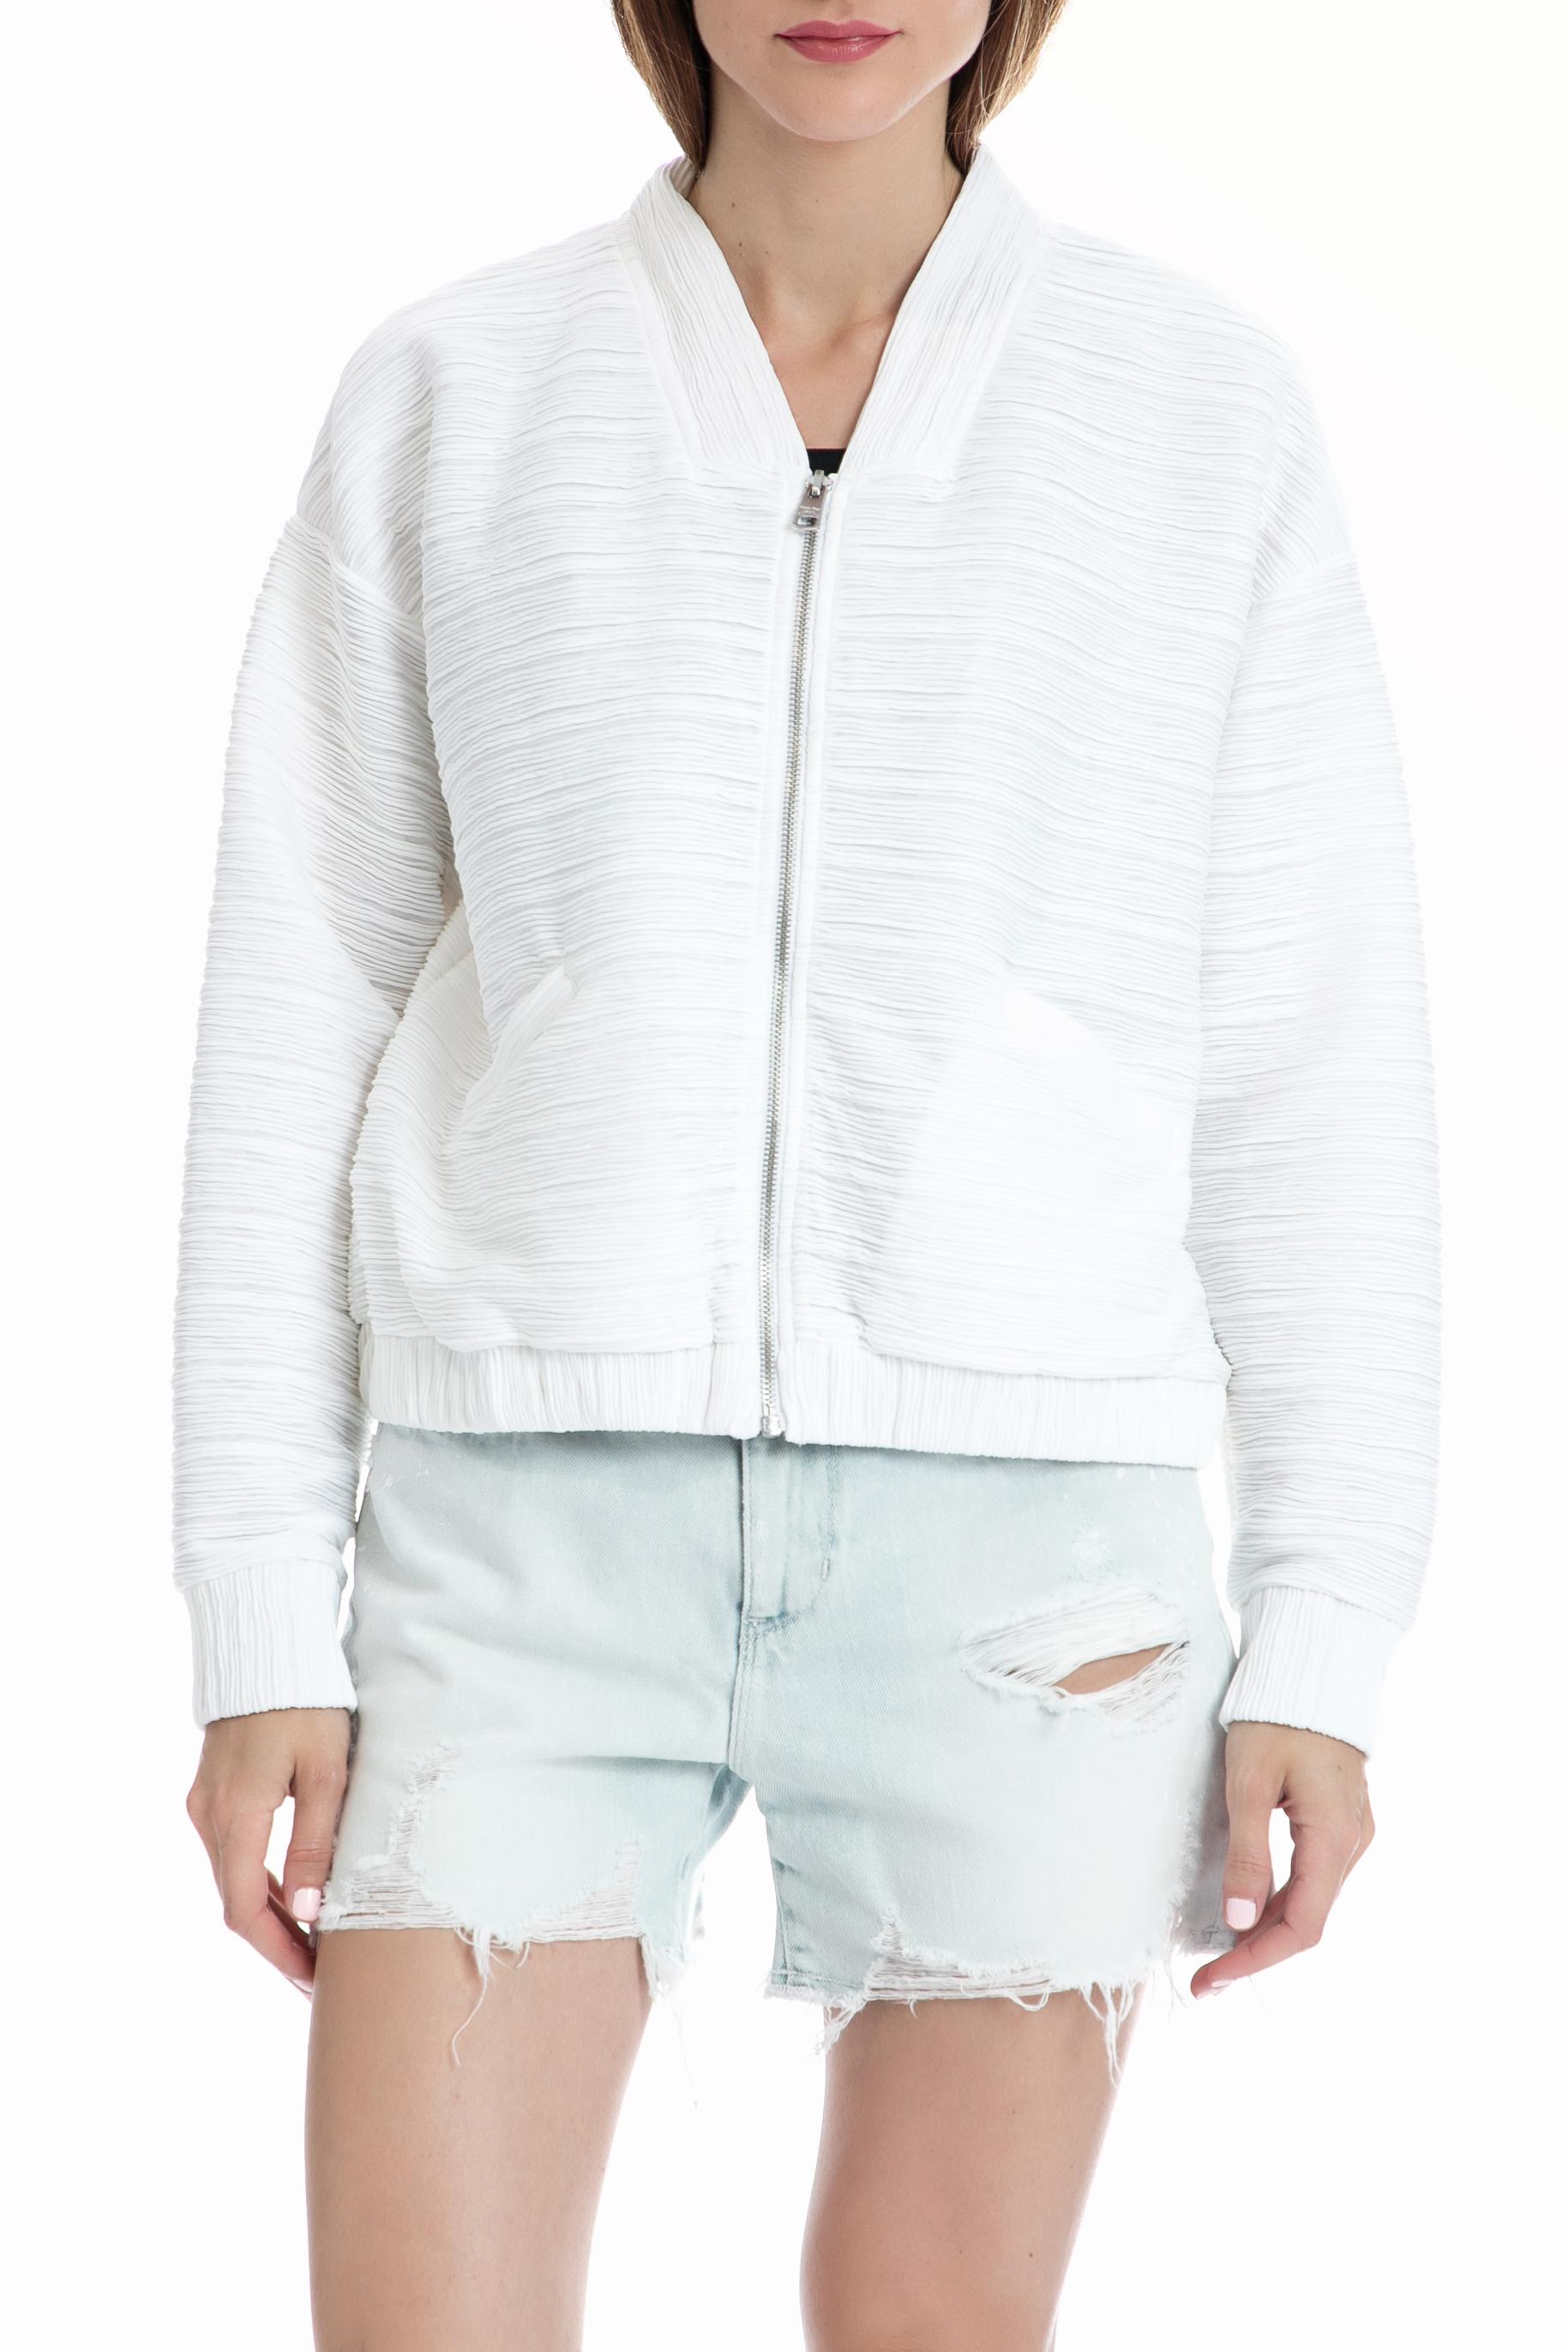 CALVIN KLEIN JEANS - Γυναικείο μπουφάν CALVIN KLEIN JEANS λευκό γυναικεία ρούχα πανωφόρια μπουφάν